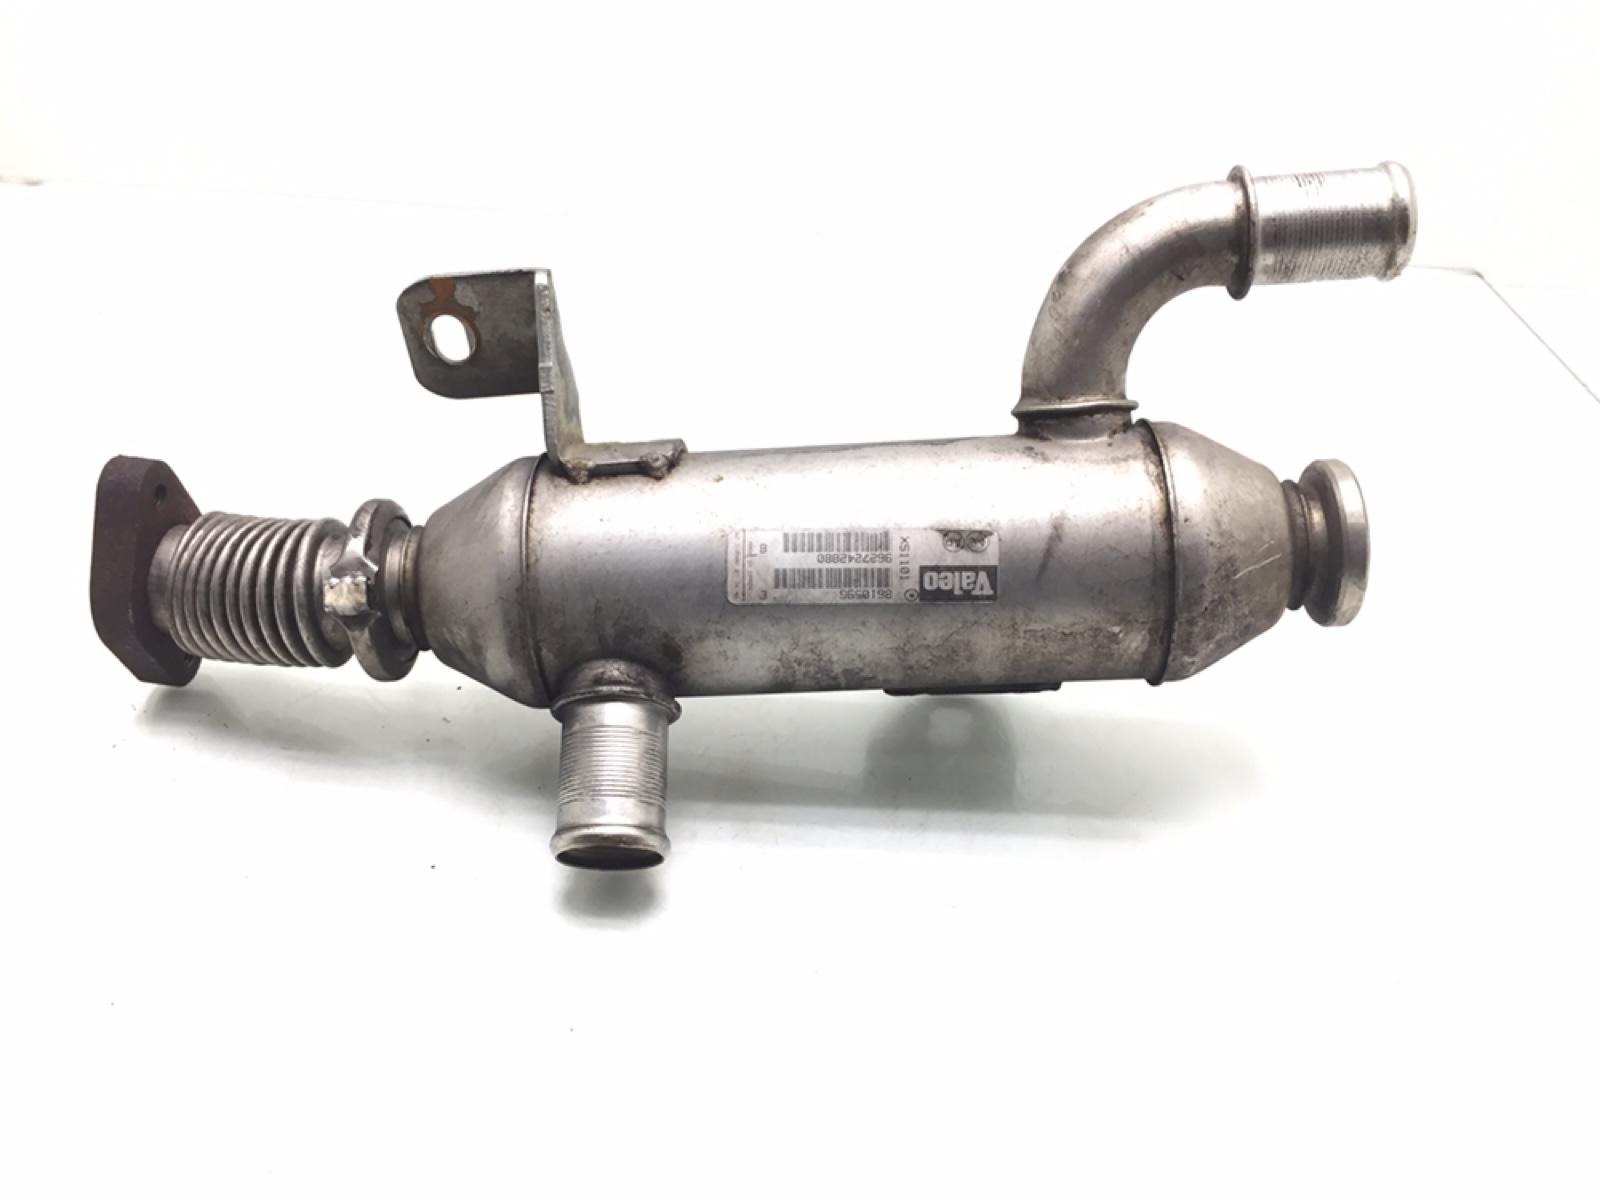 Радиатор egr Peugeot 406 2.0 HDI 2002 (б/у)